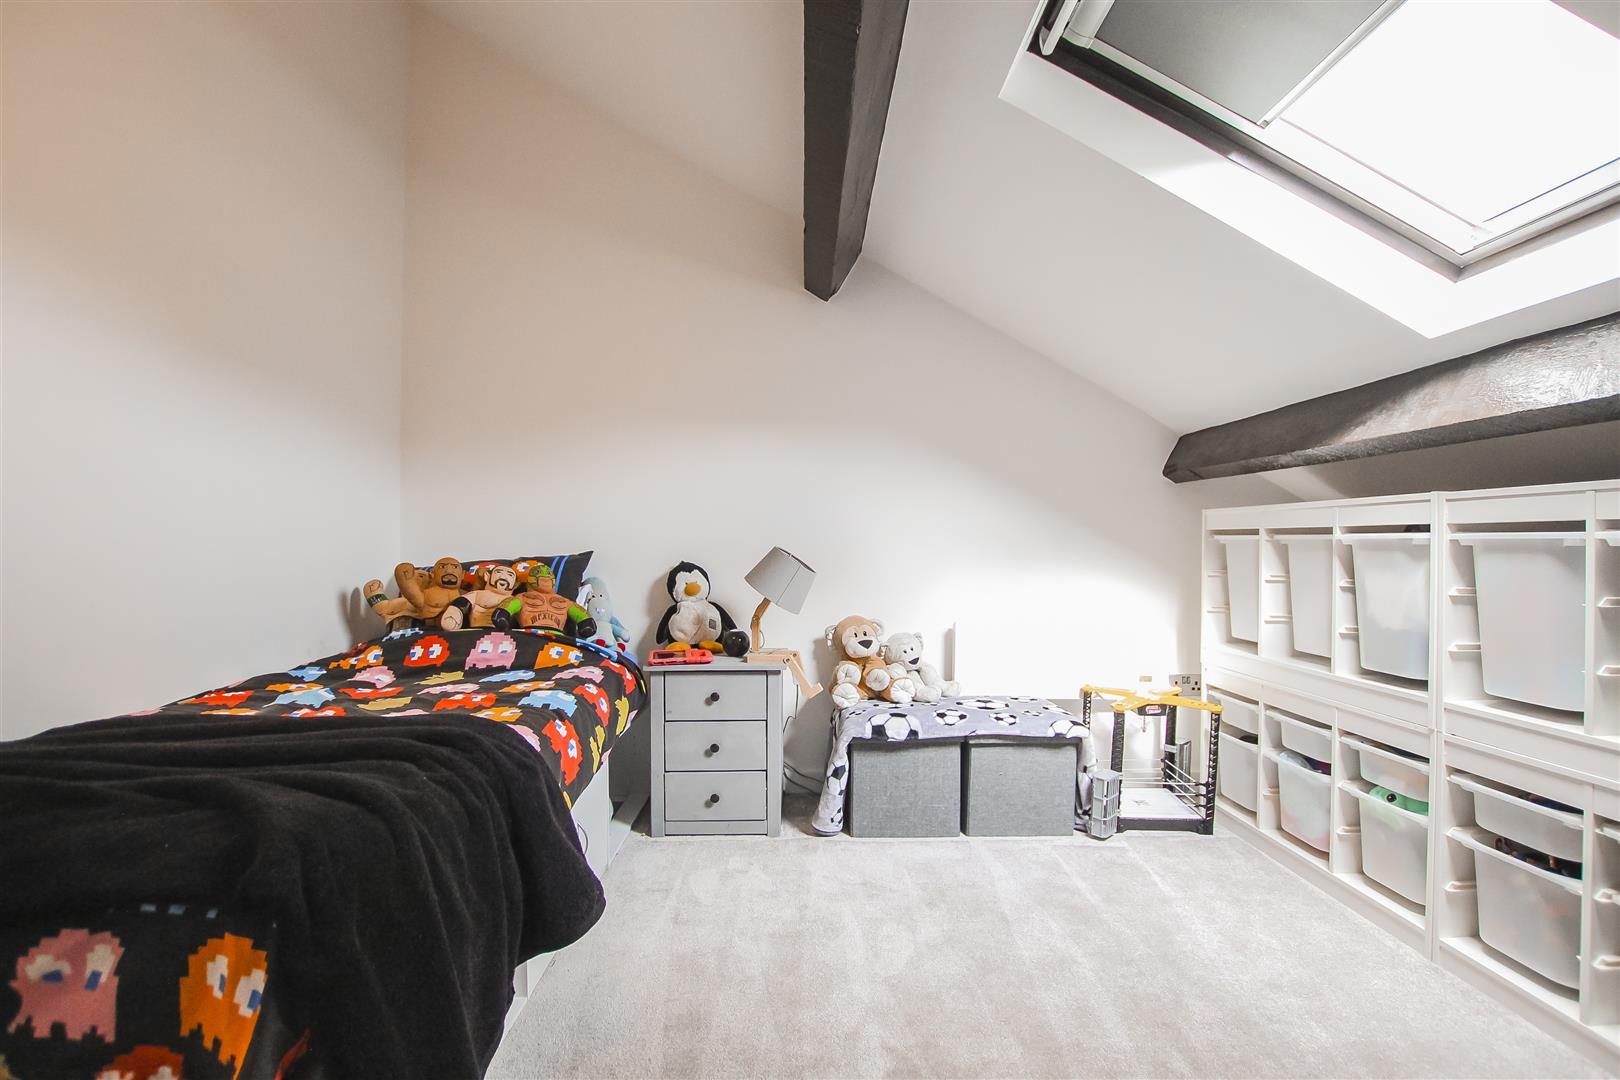 3 Bedroom Duplex Apartment For Sale - Image 51